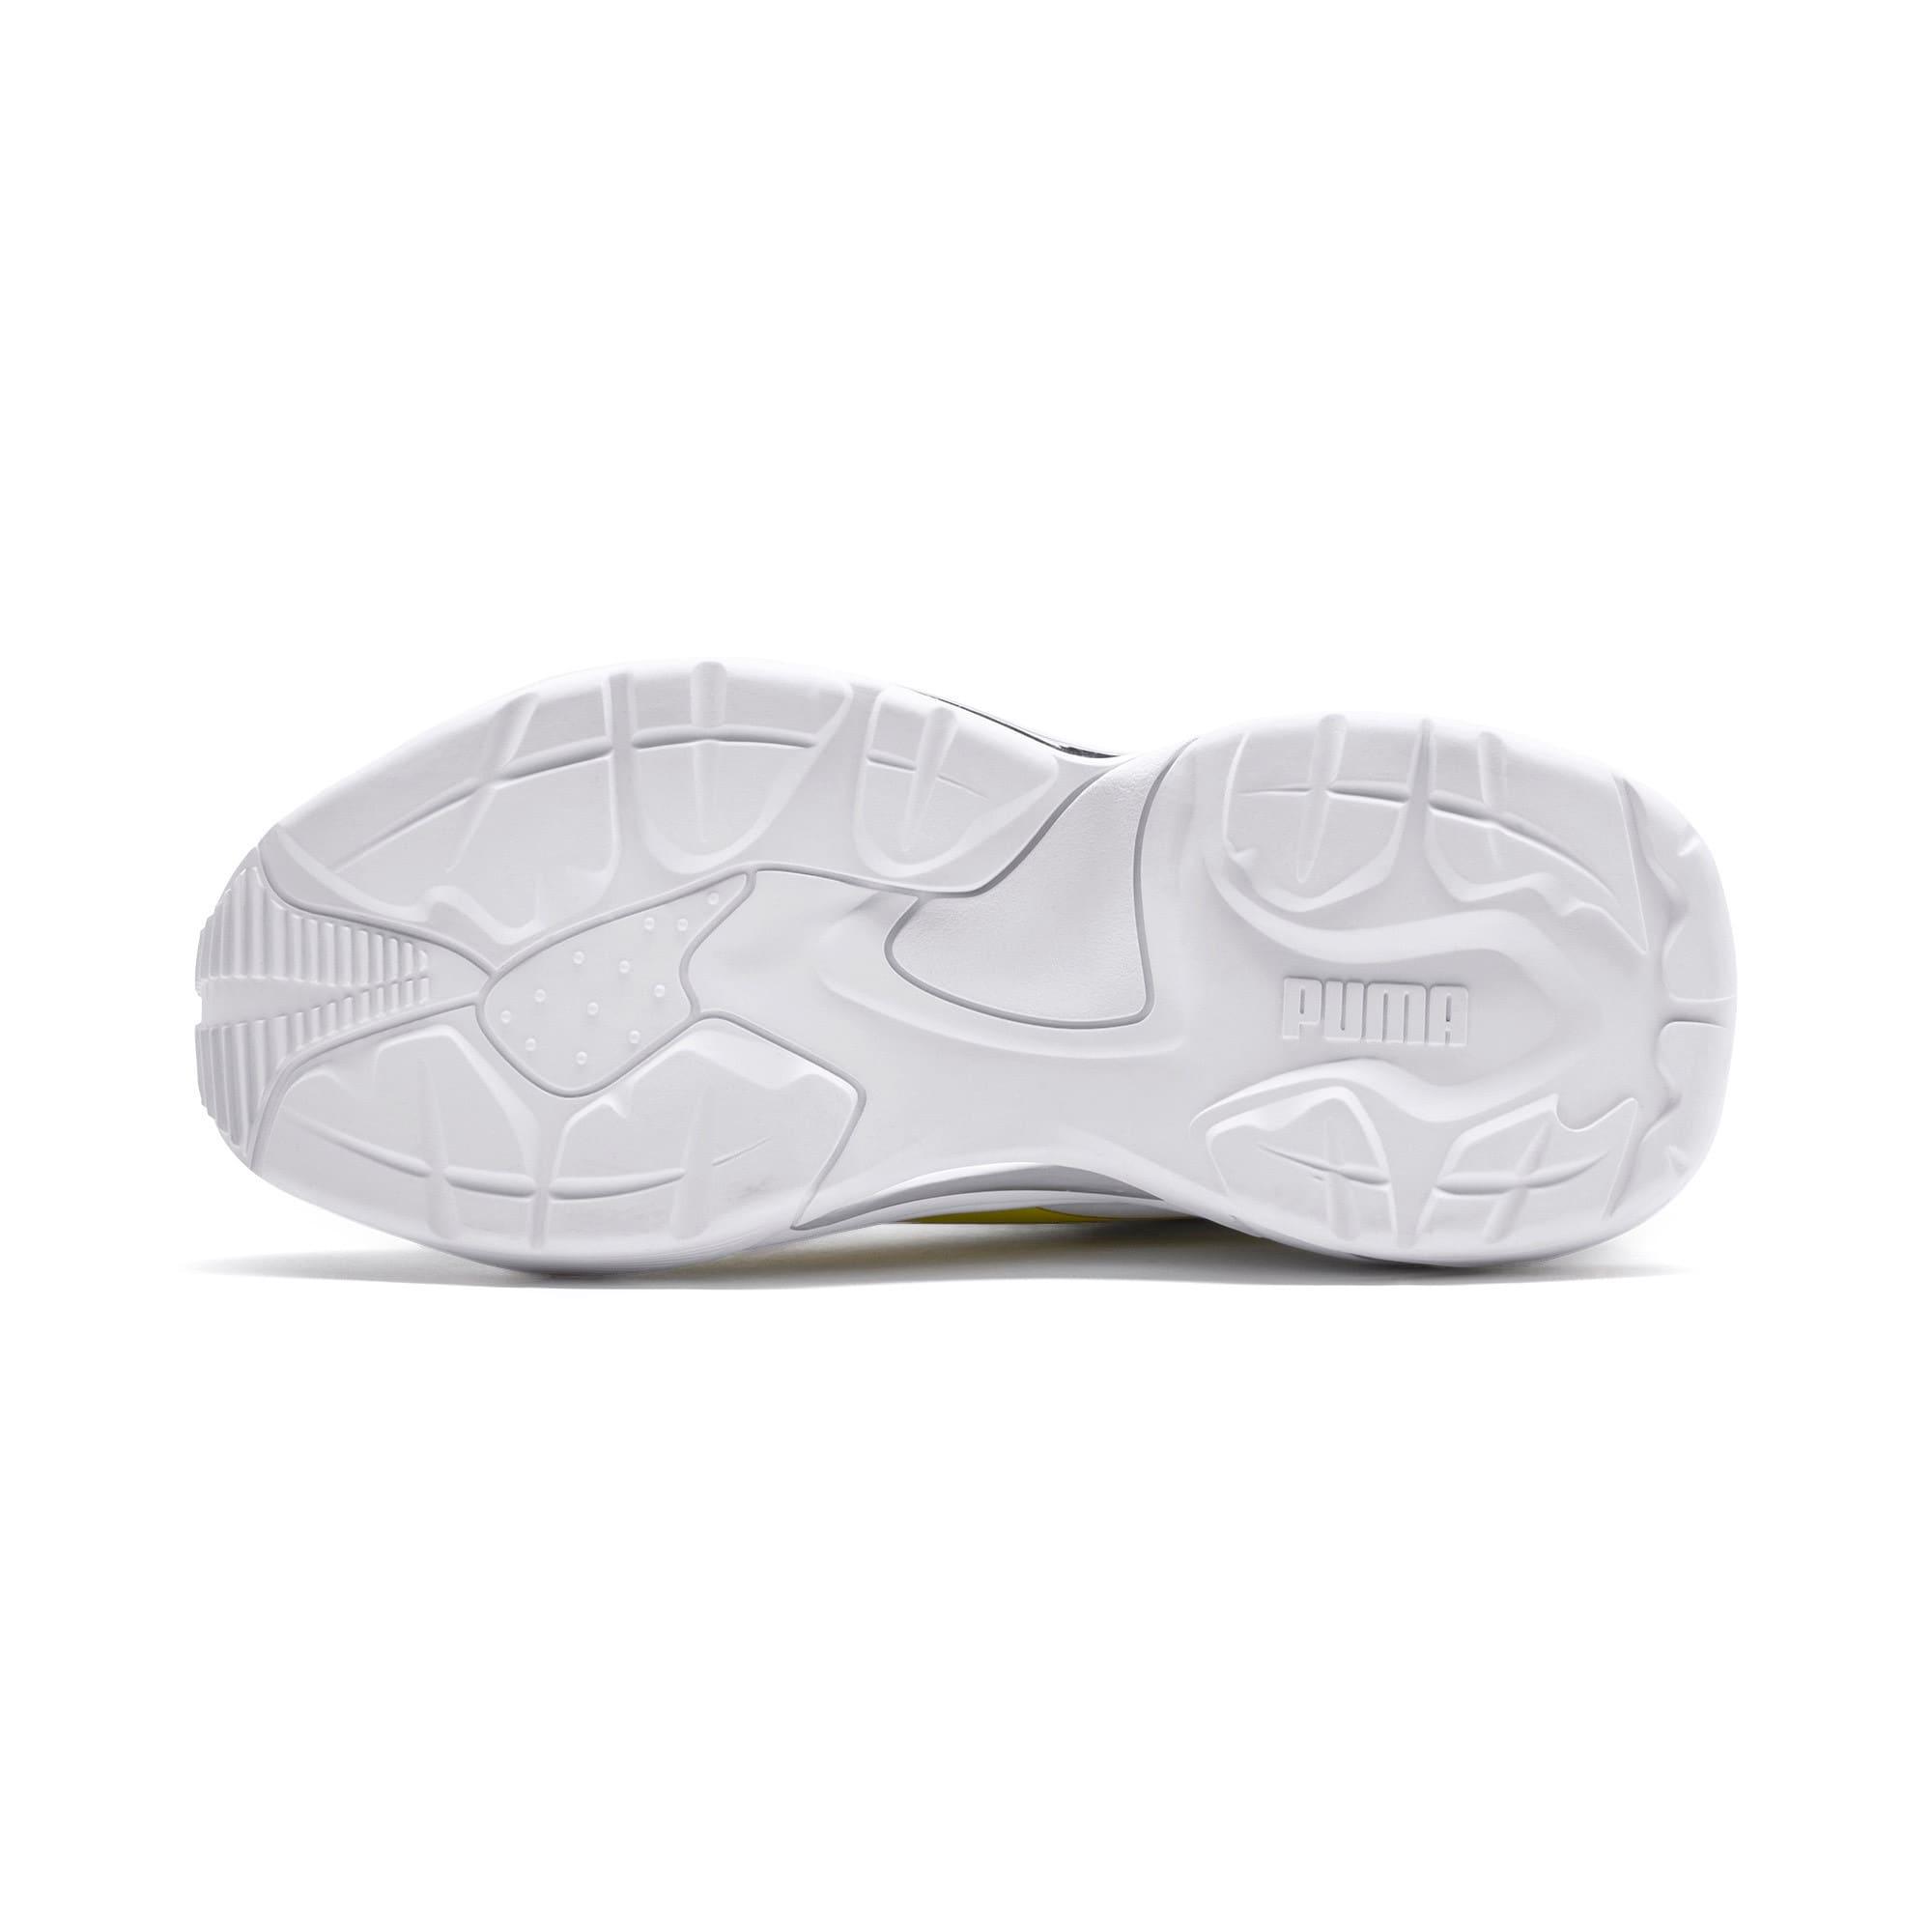 Miniatura 5 de Zapatos deportivos para mujer Thunder TrailblazerMetallic, Puma White-Blazing Yellow, mediano